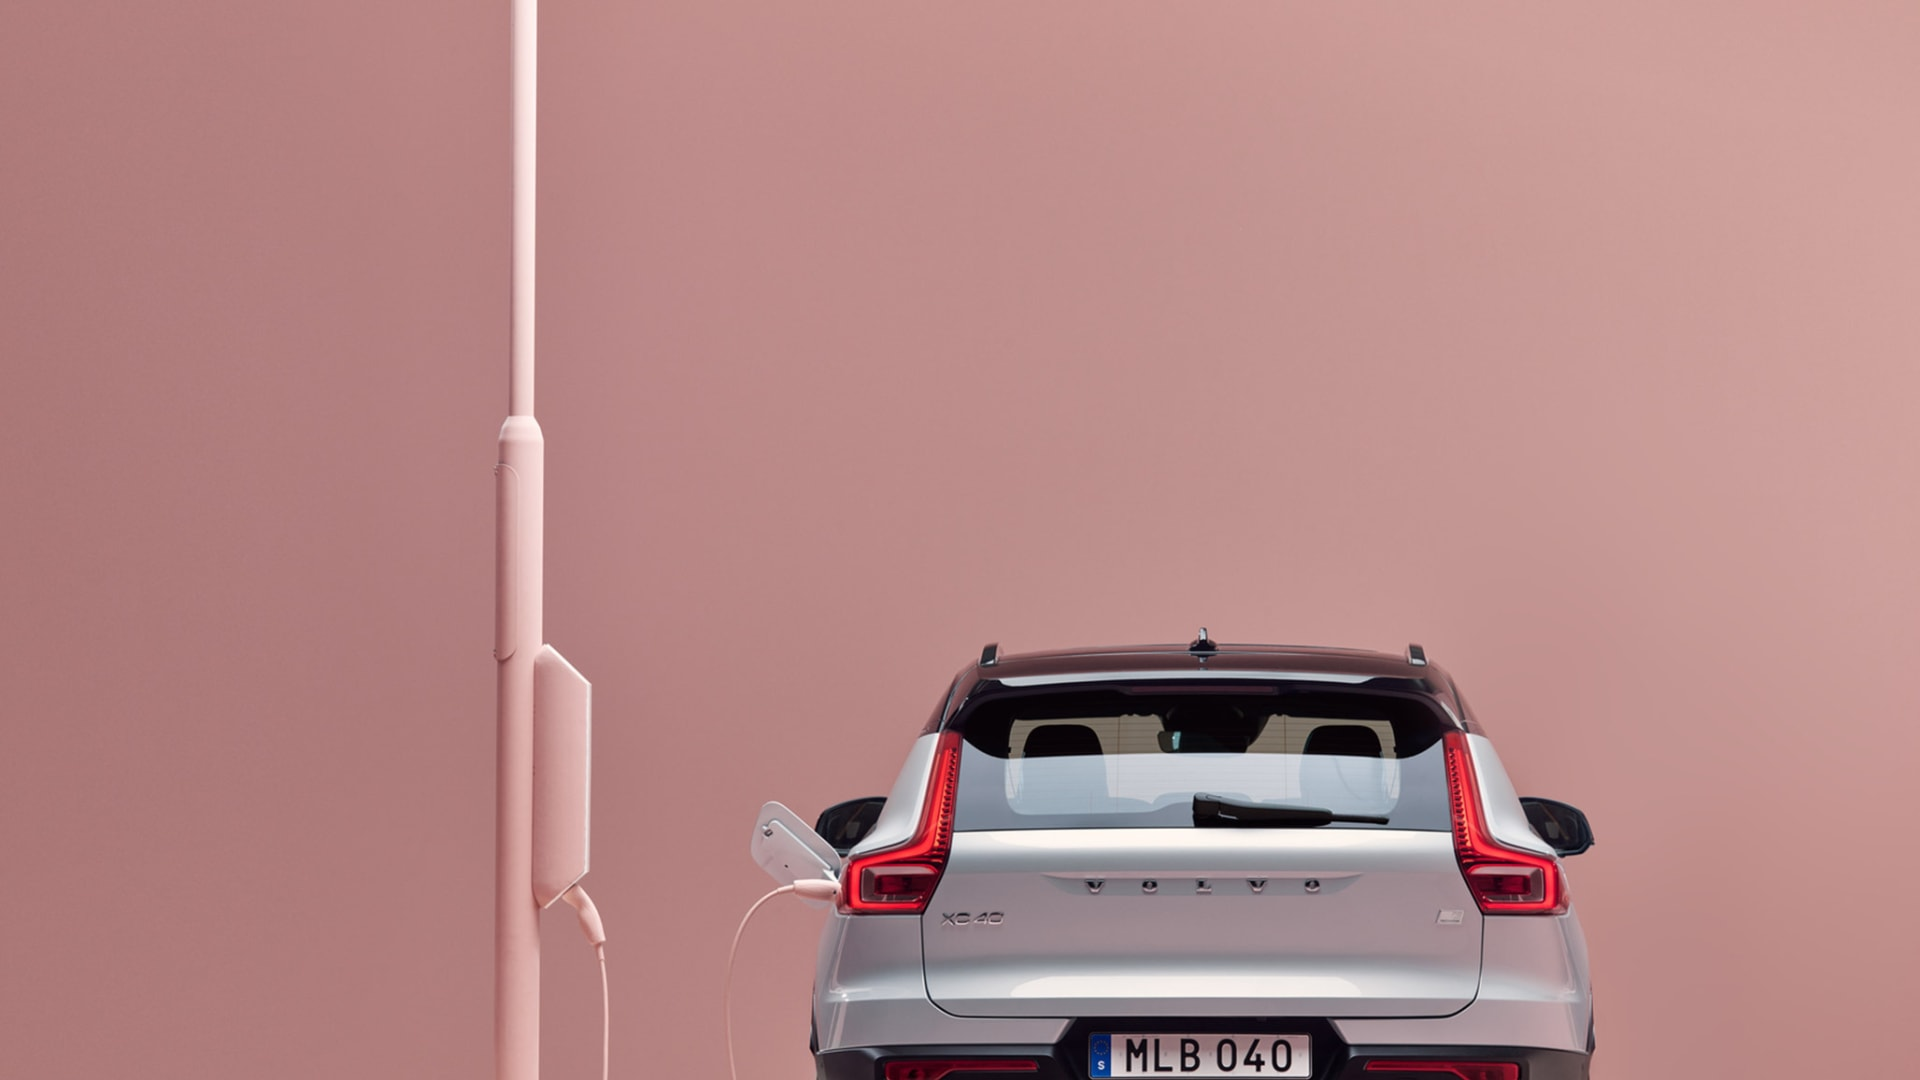 Volvo car rear view